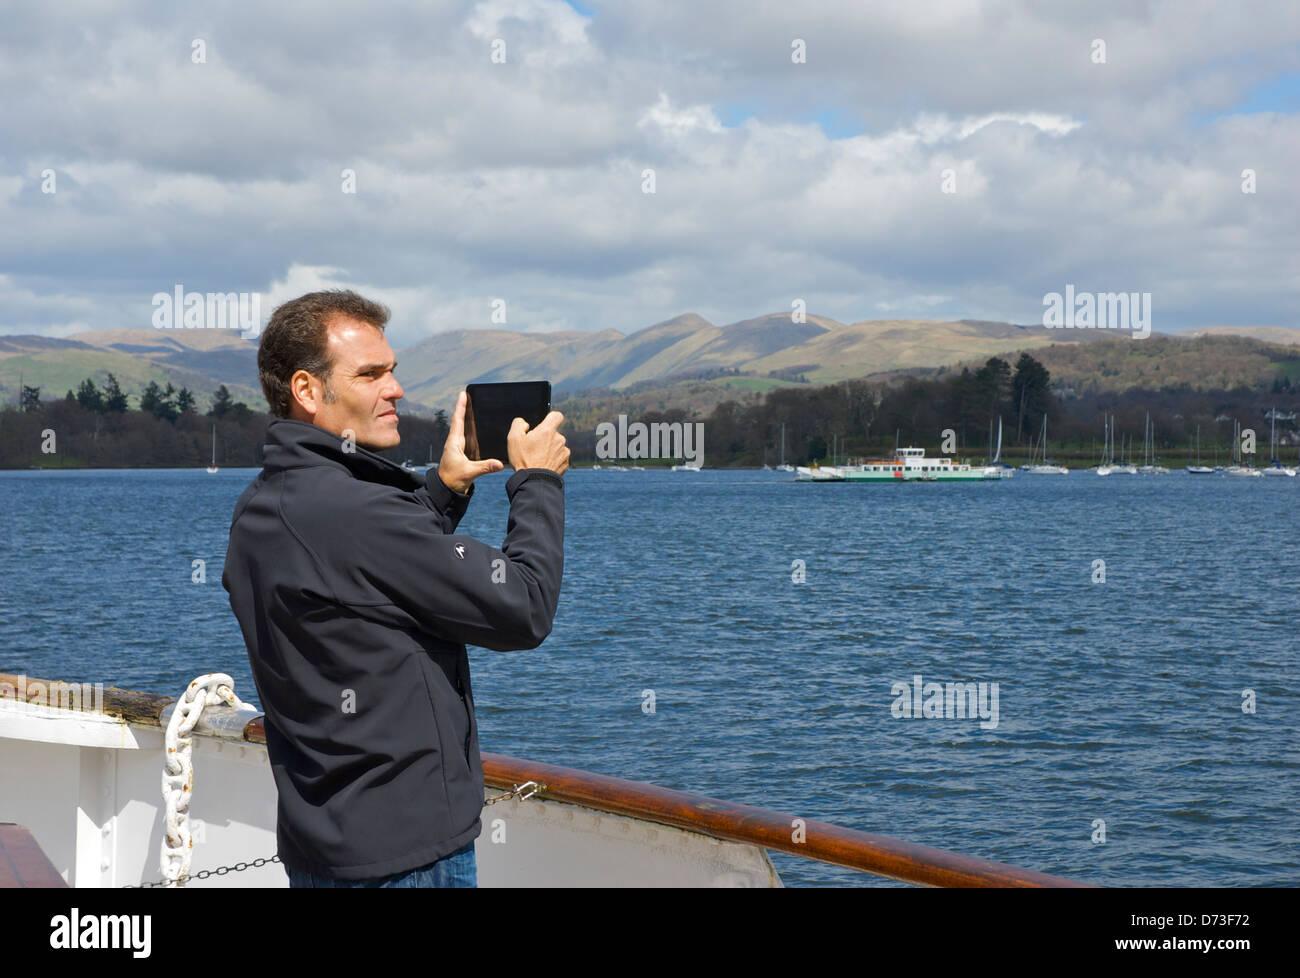 Menschen fotografieren mit seinem iPad, Lake Windermere, Lake District National Park, Cumbria, England UK Stockbild